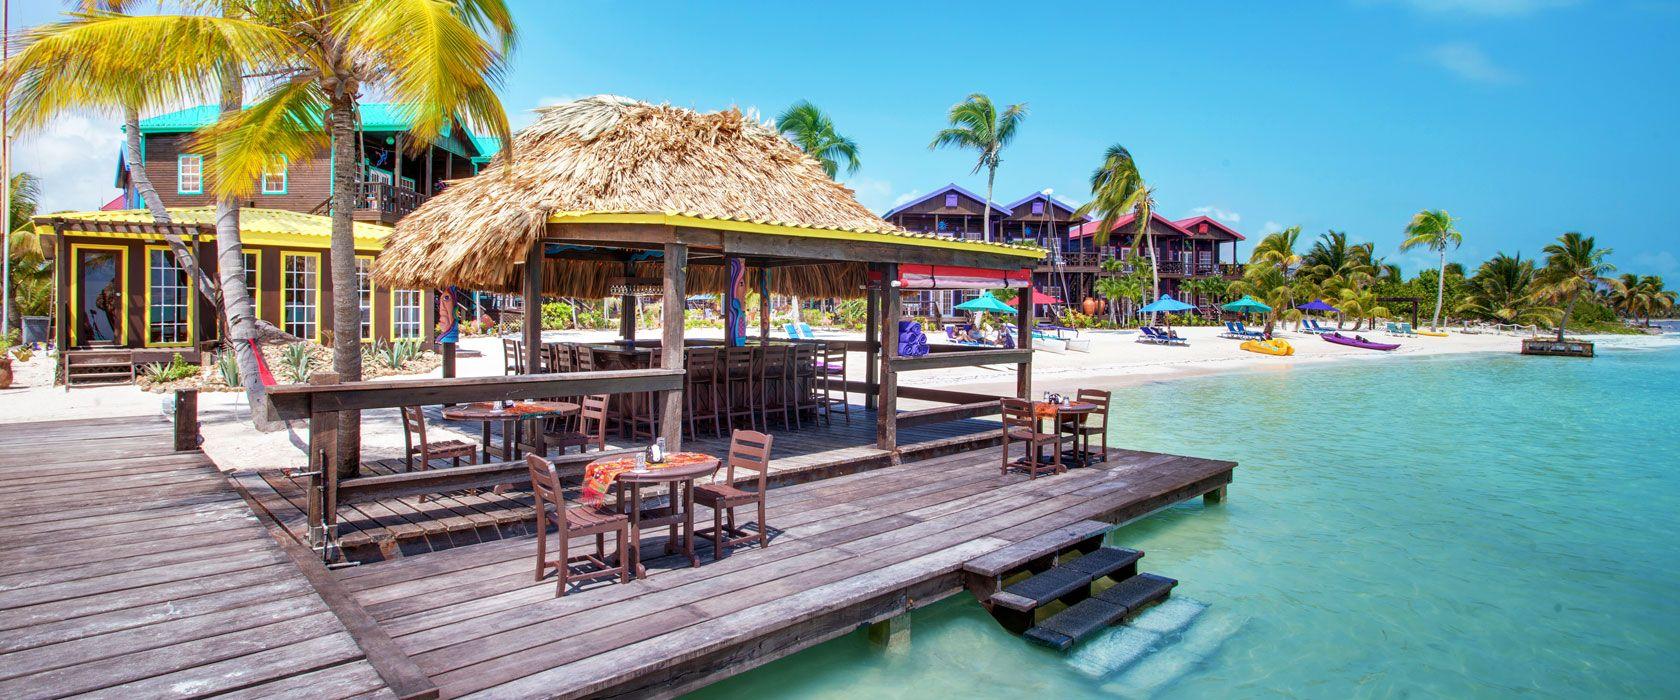 Beach Belize Resort Xtan 240 Night 2000 Person With Flight